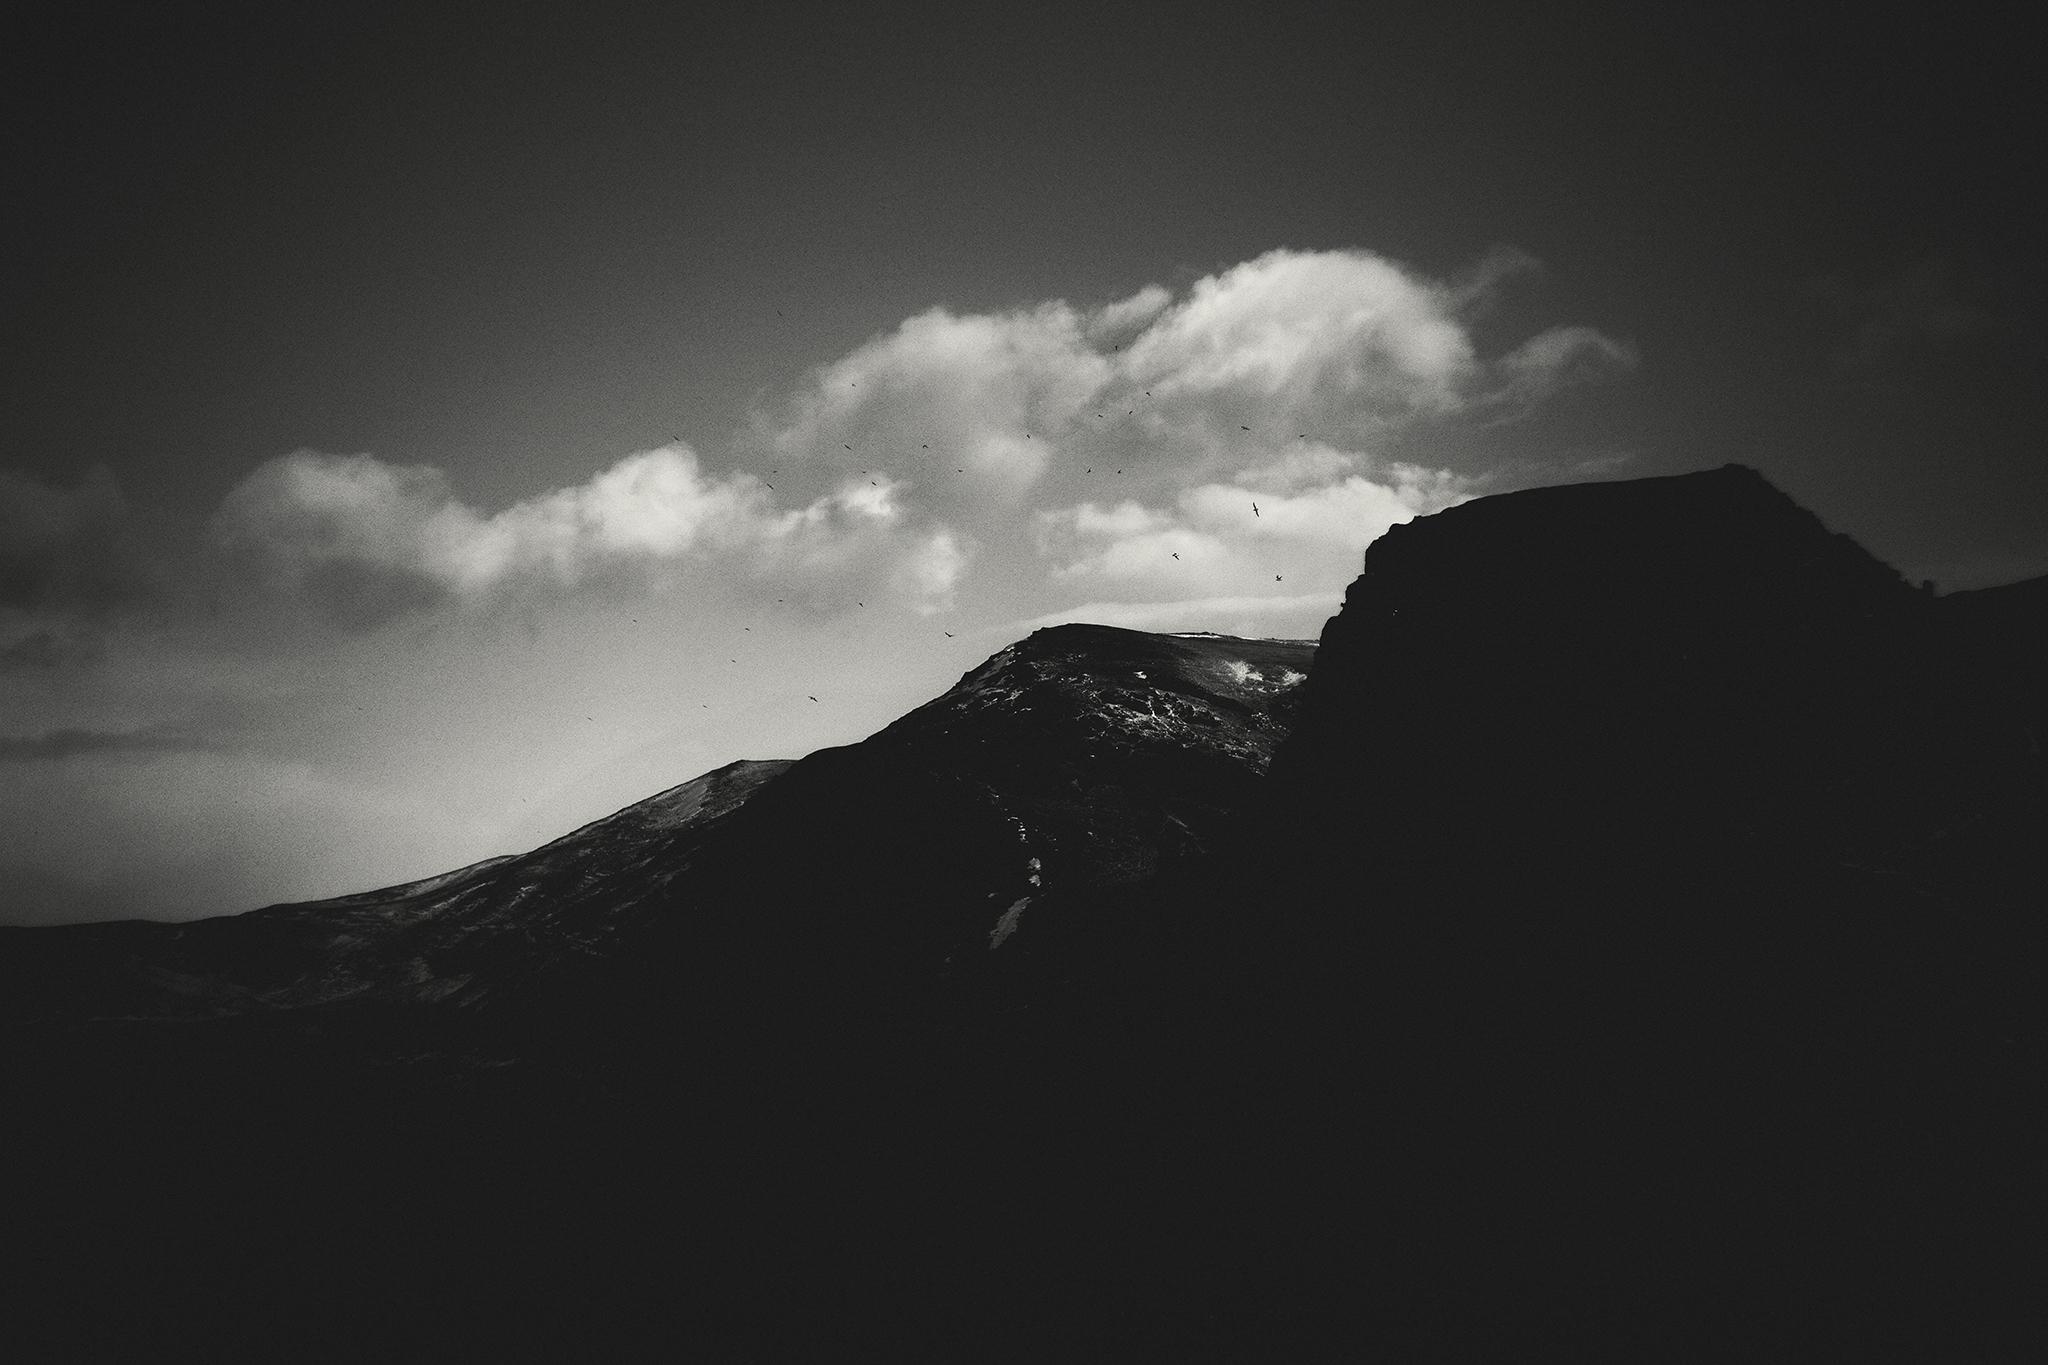 Iceland_in_blackandwhite_10.jpg